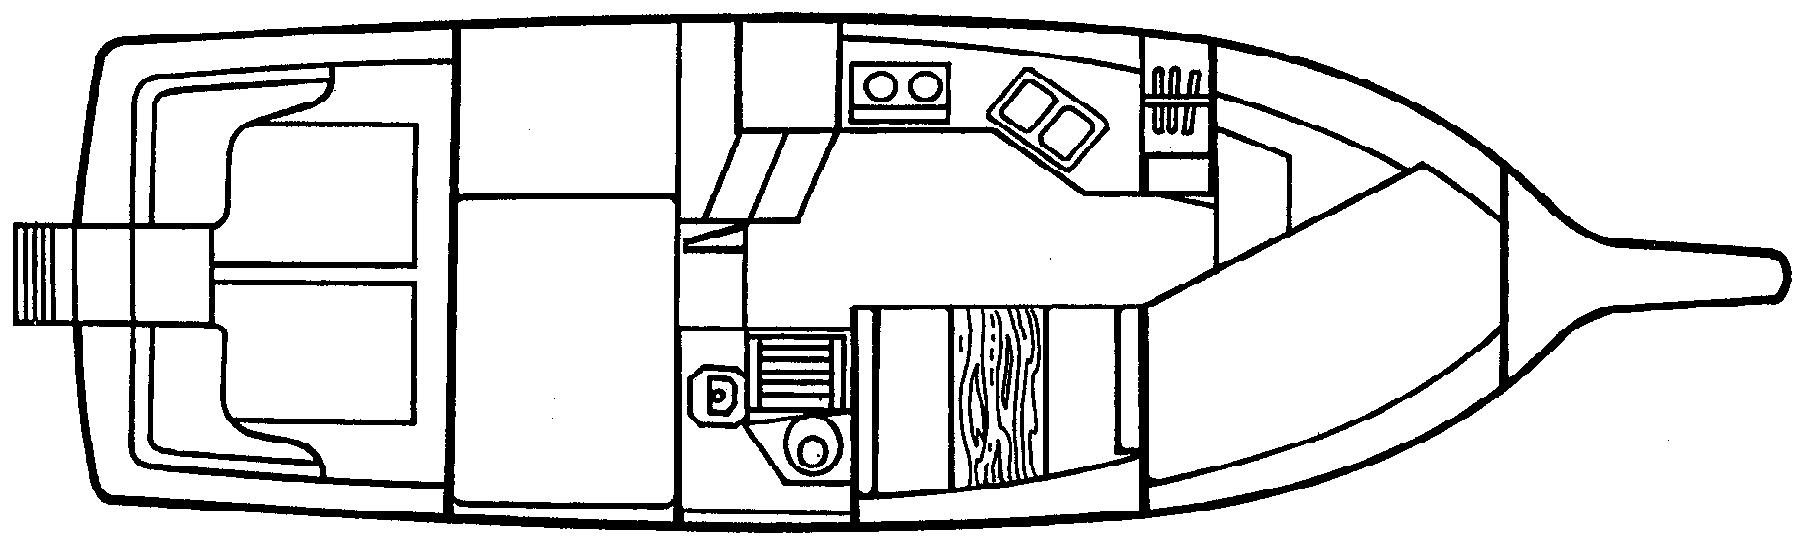 297 Elegante; 2970 Esprit Floor Plan 1